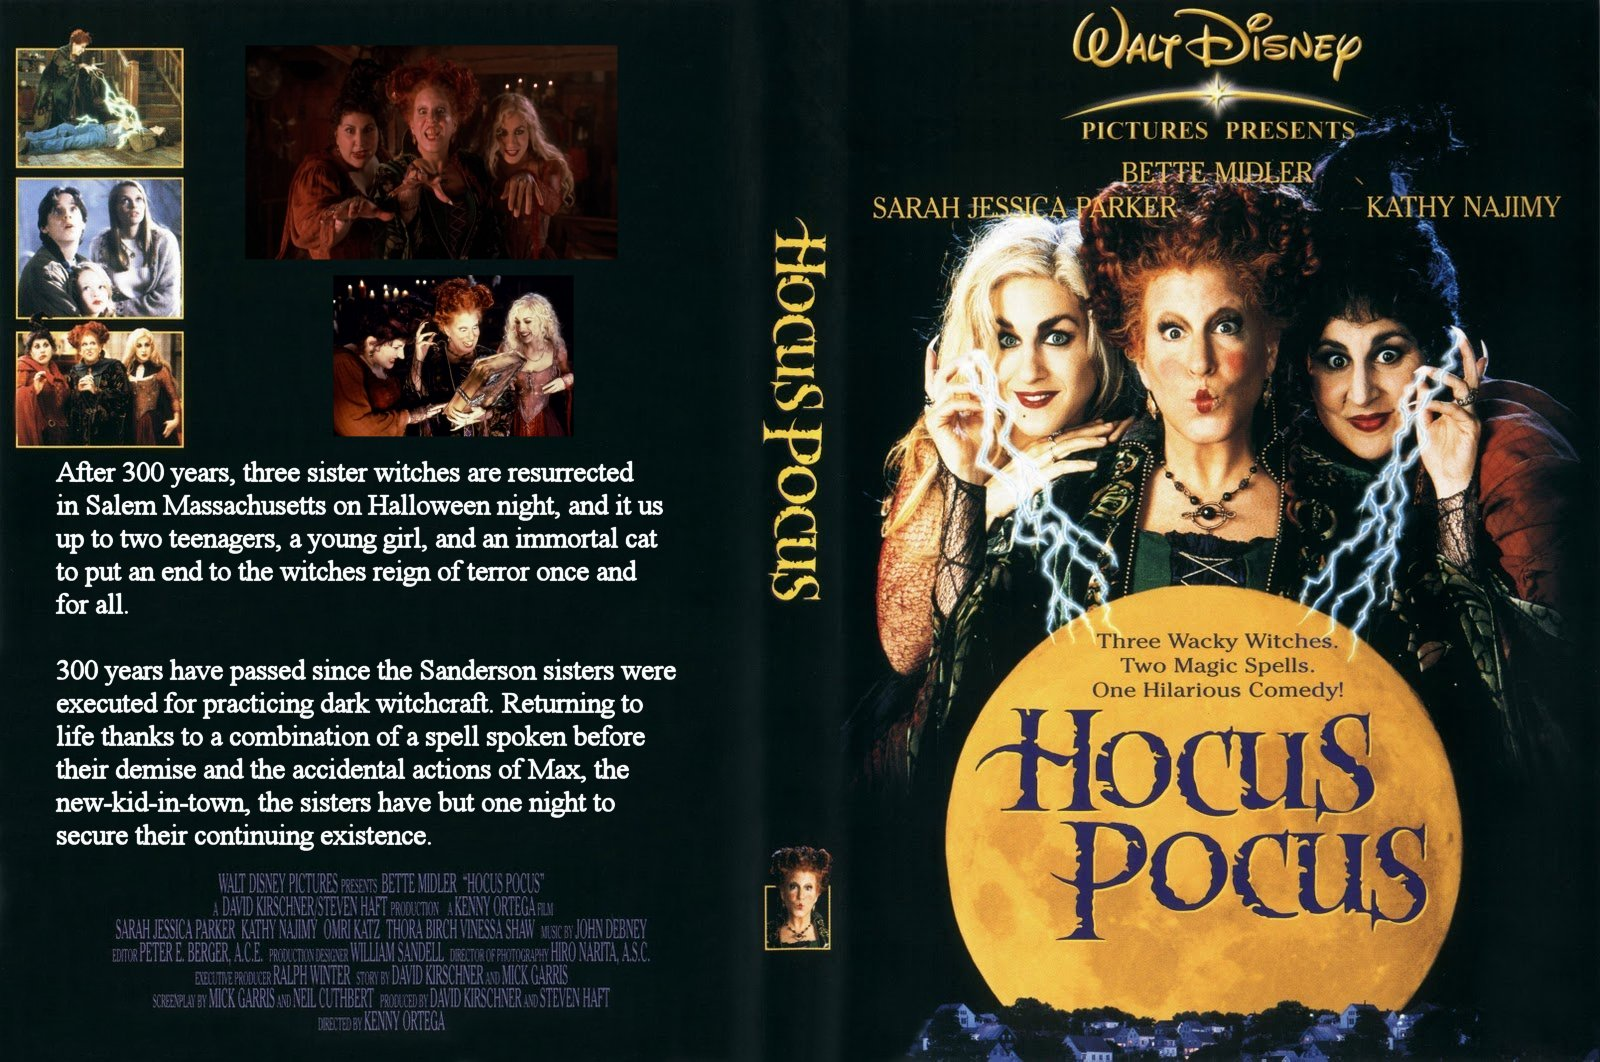 hocus pocus abracadabra essay Hocus pocus blonde before after mystical taupe before after magic dazzle brown before after abracadabra black before after hocus pocus blonde before after.